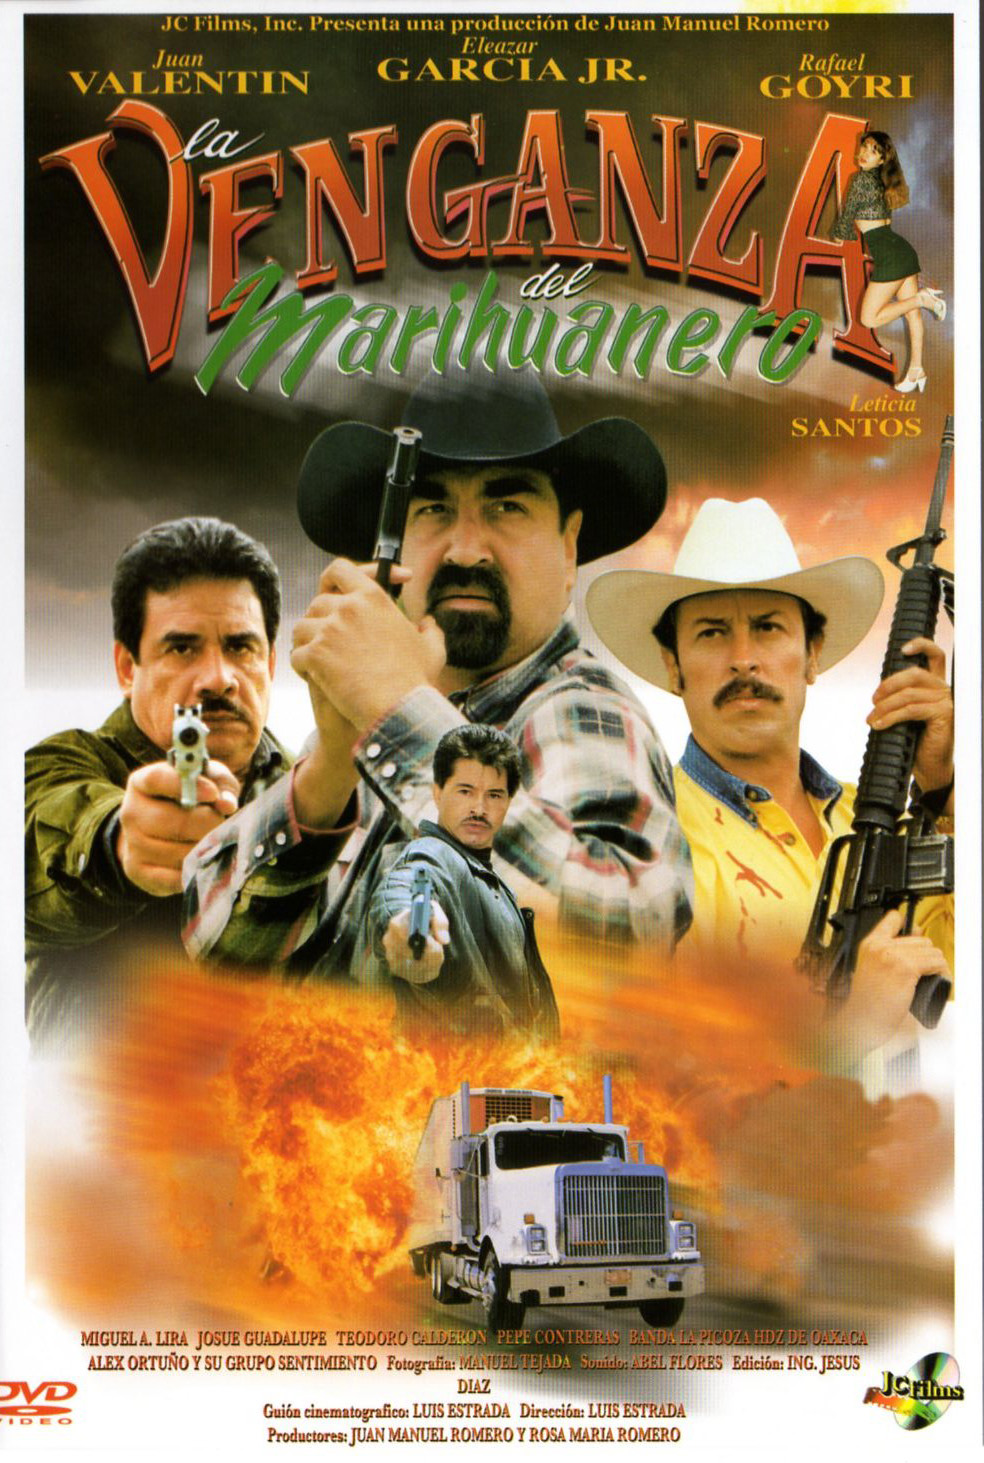 La Venganza Del Marihuanero Video 2000 Imdb